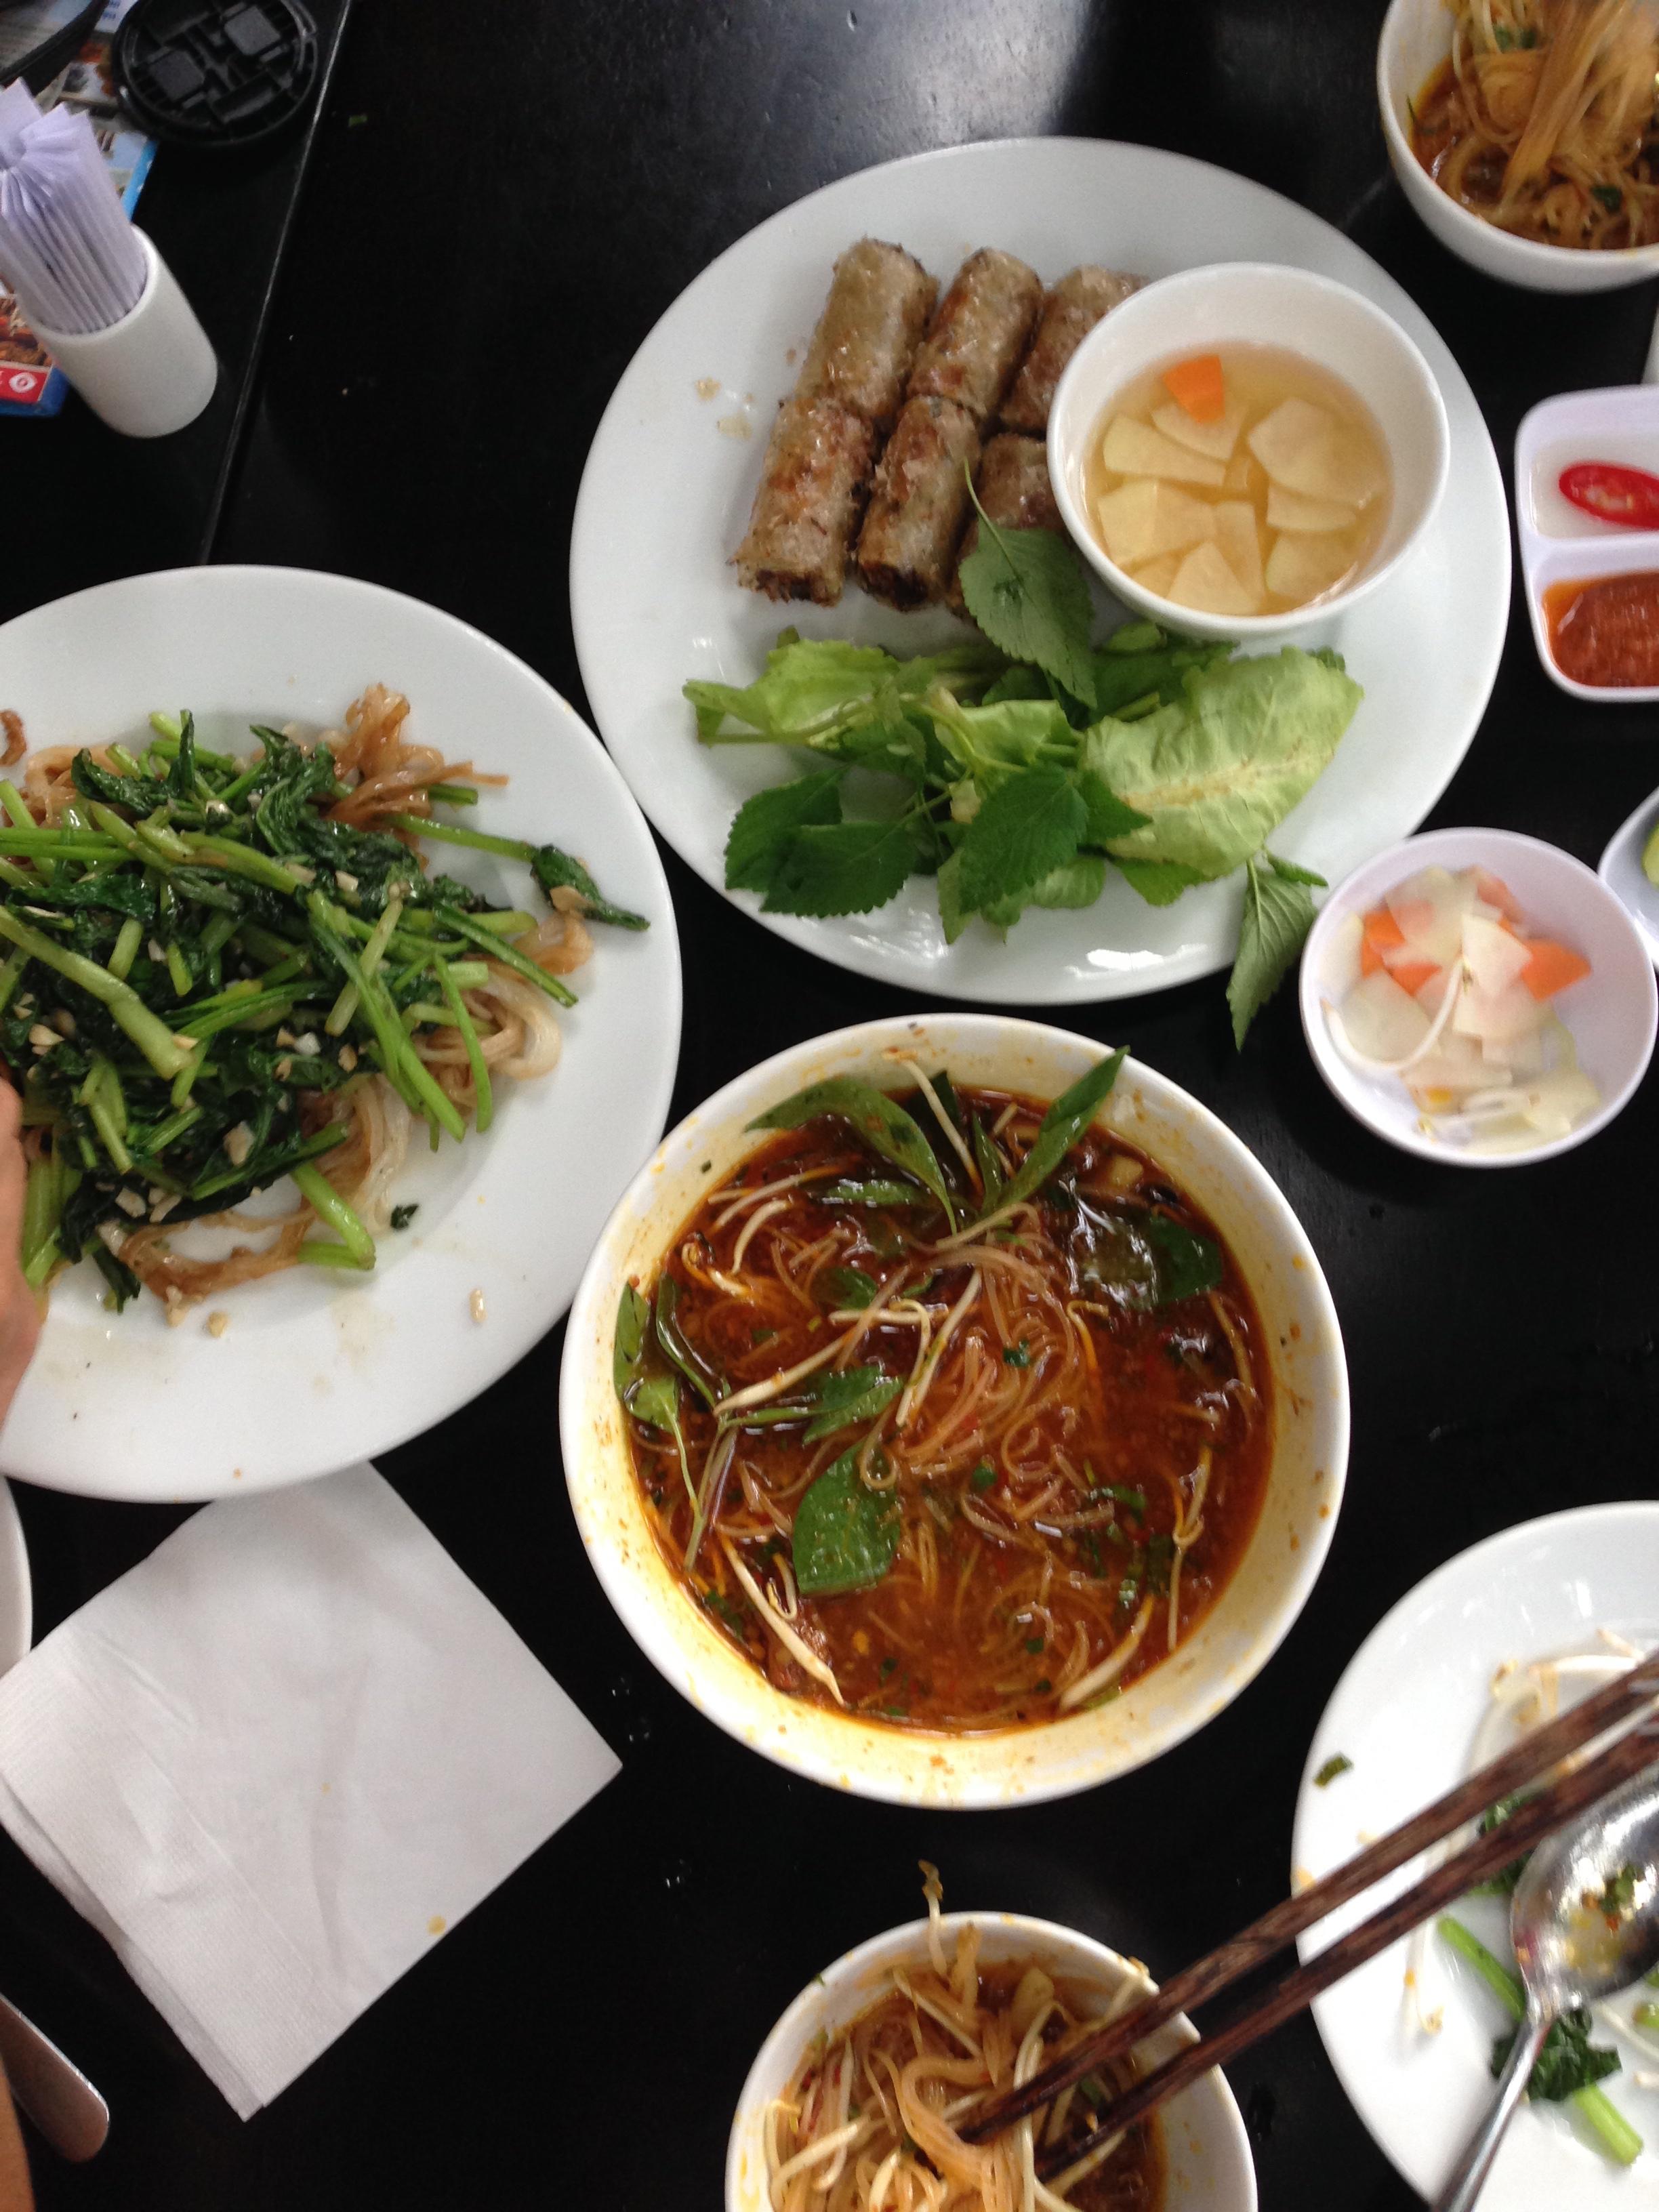 美味的越南餐- flatlay - illumelation.combeplay3体育官方下载